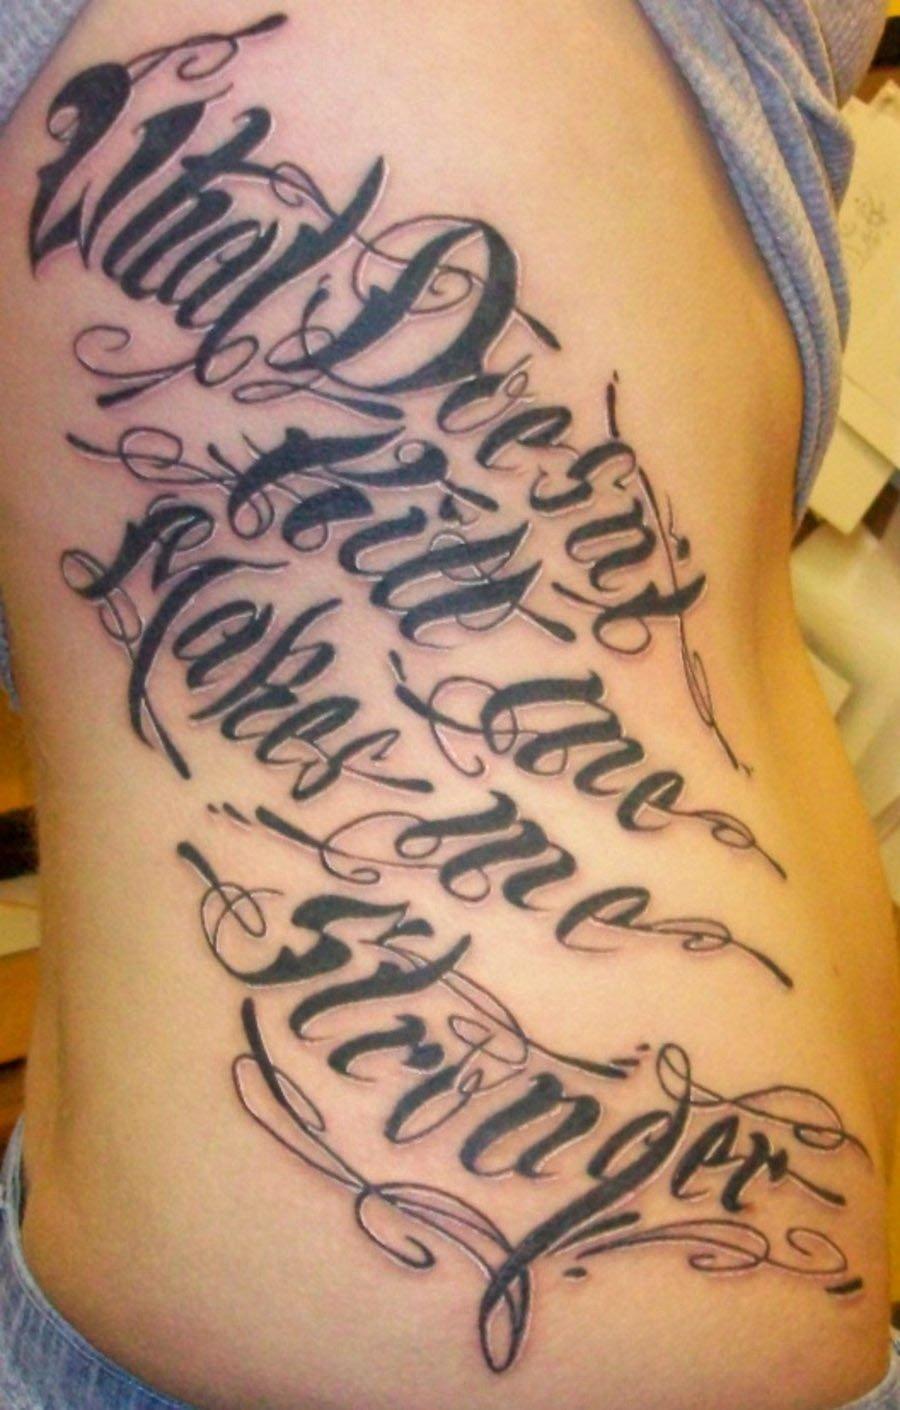 Script Fonts for Tattoos Best Of Tattoo Fonts Cursiveteulugar